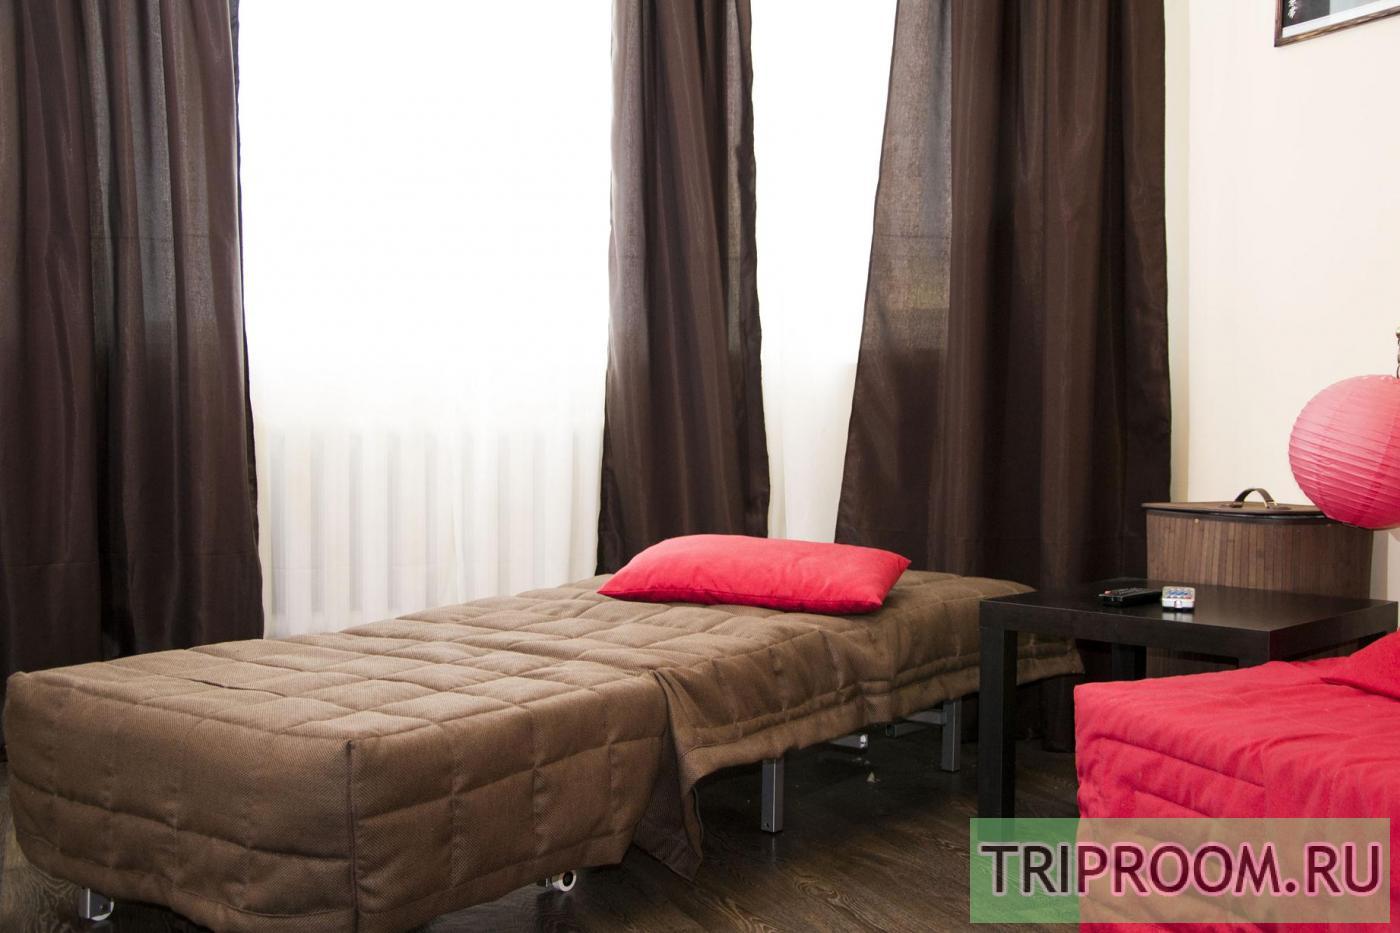 1-комнатная квартира посуточно (вариант № 14712), ул. Петра Смородина улица, фото № 5